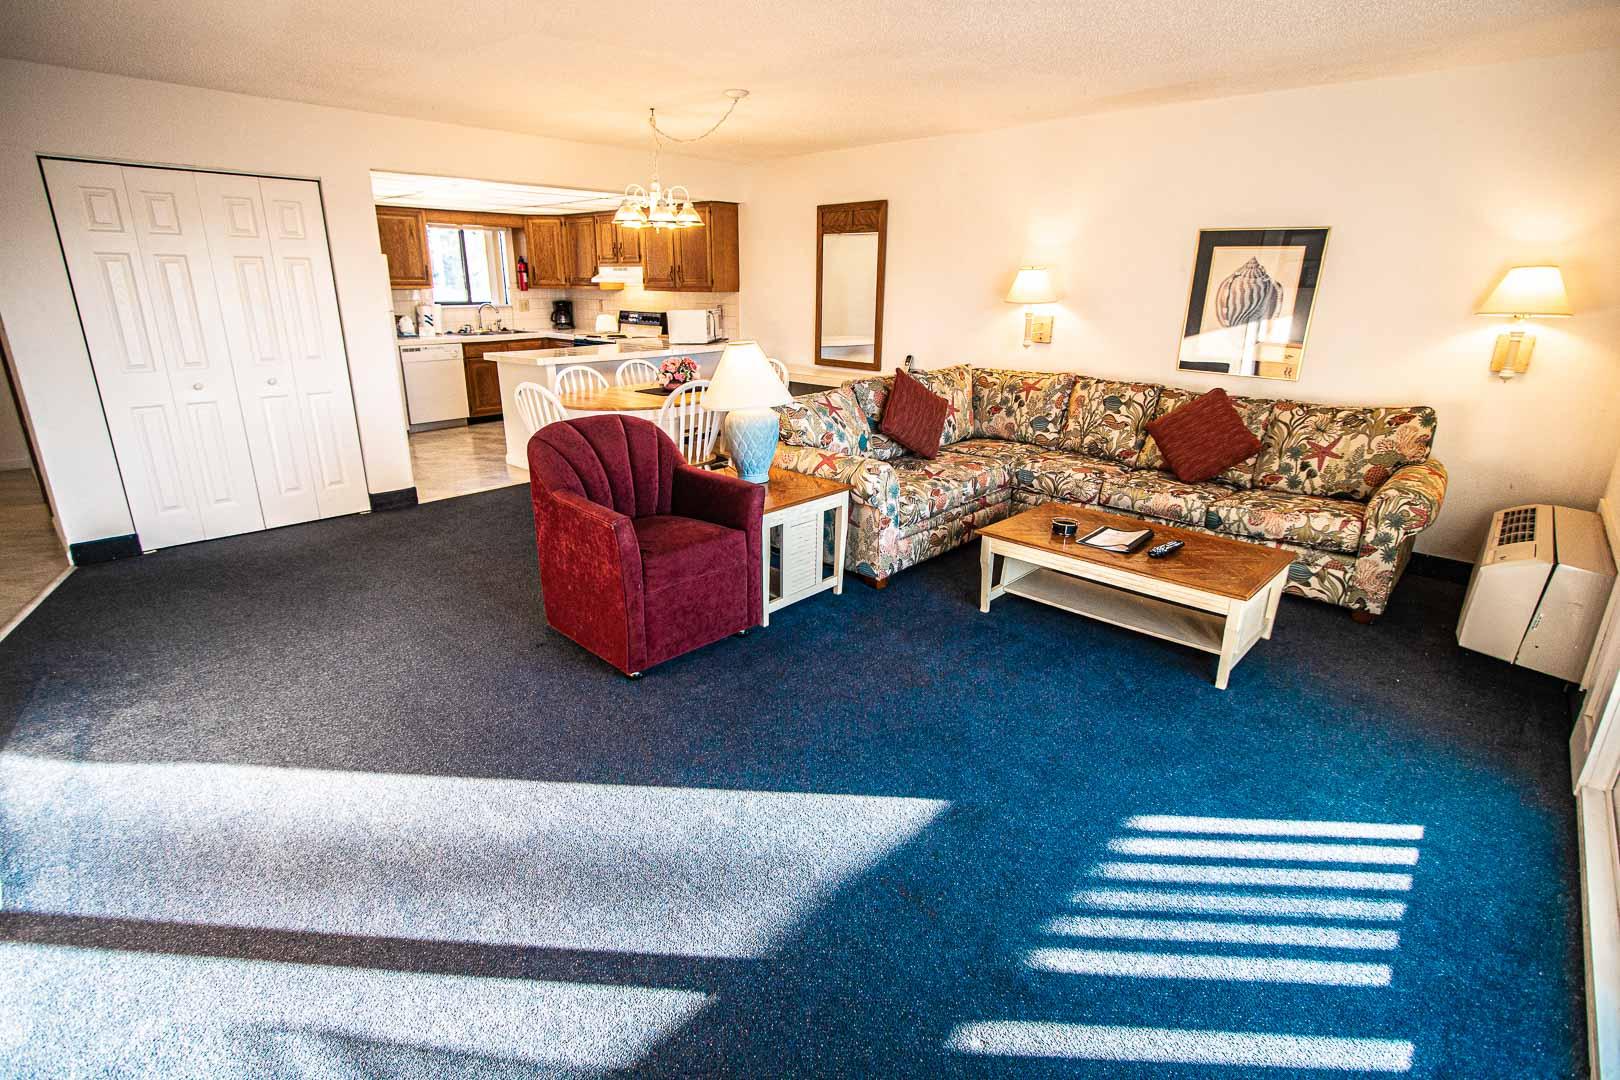 A cozy living room area at VRI's Harbourside II in New Bern, North Carolina.